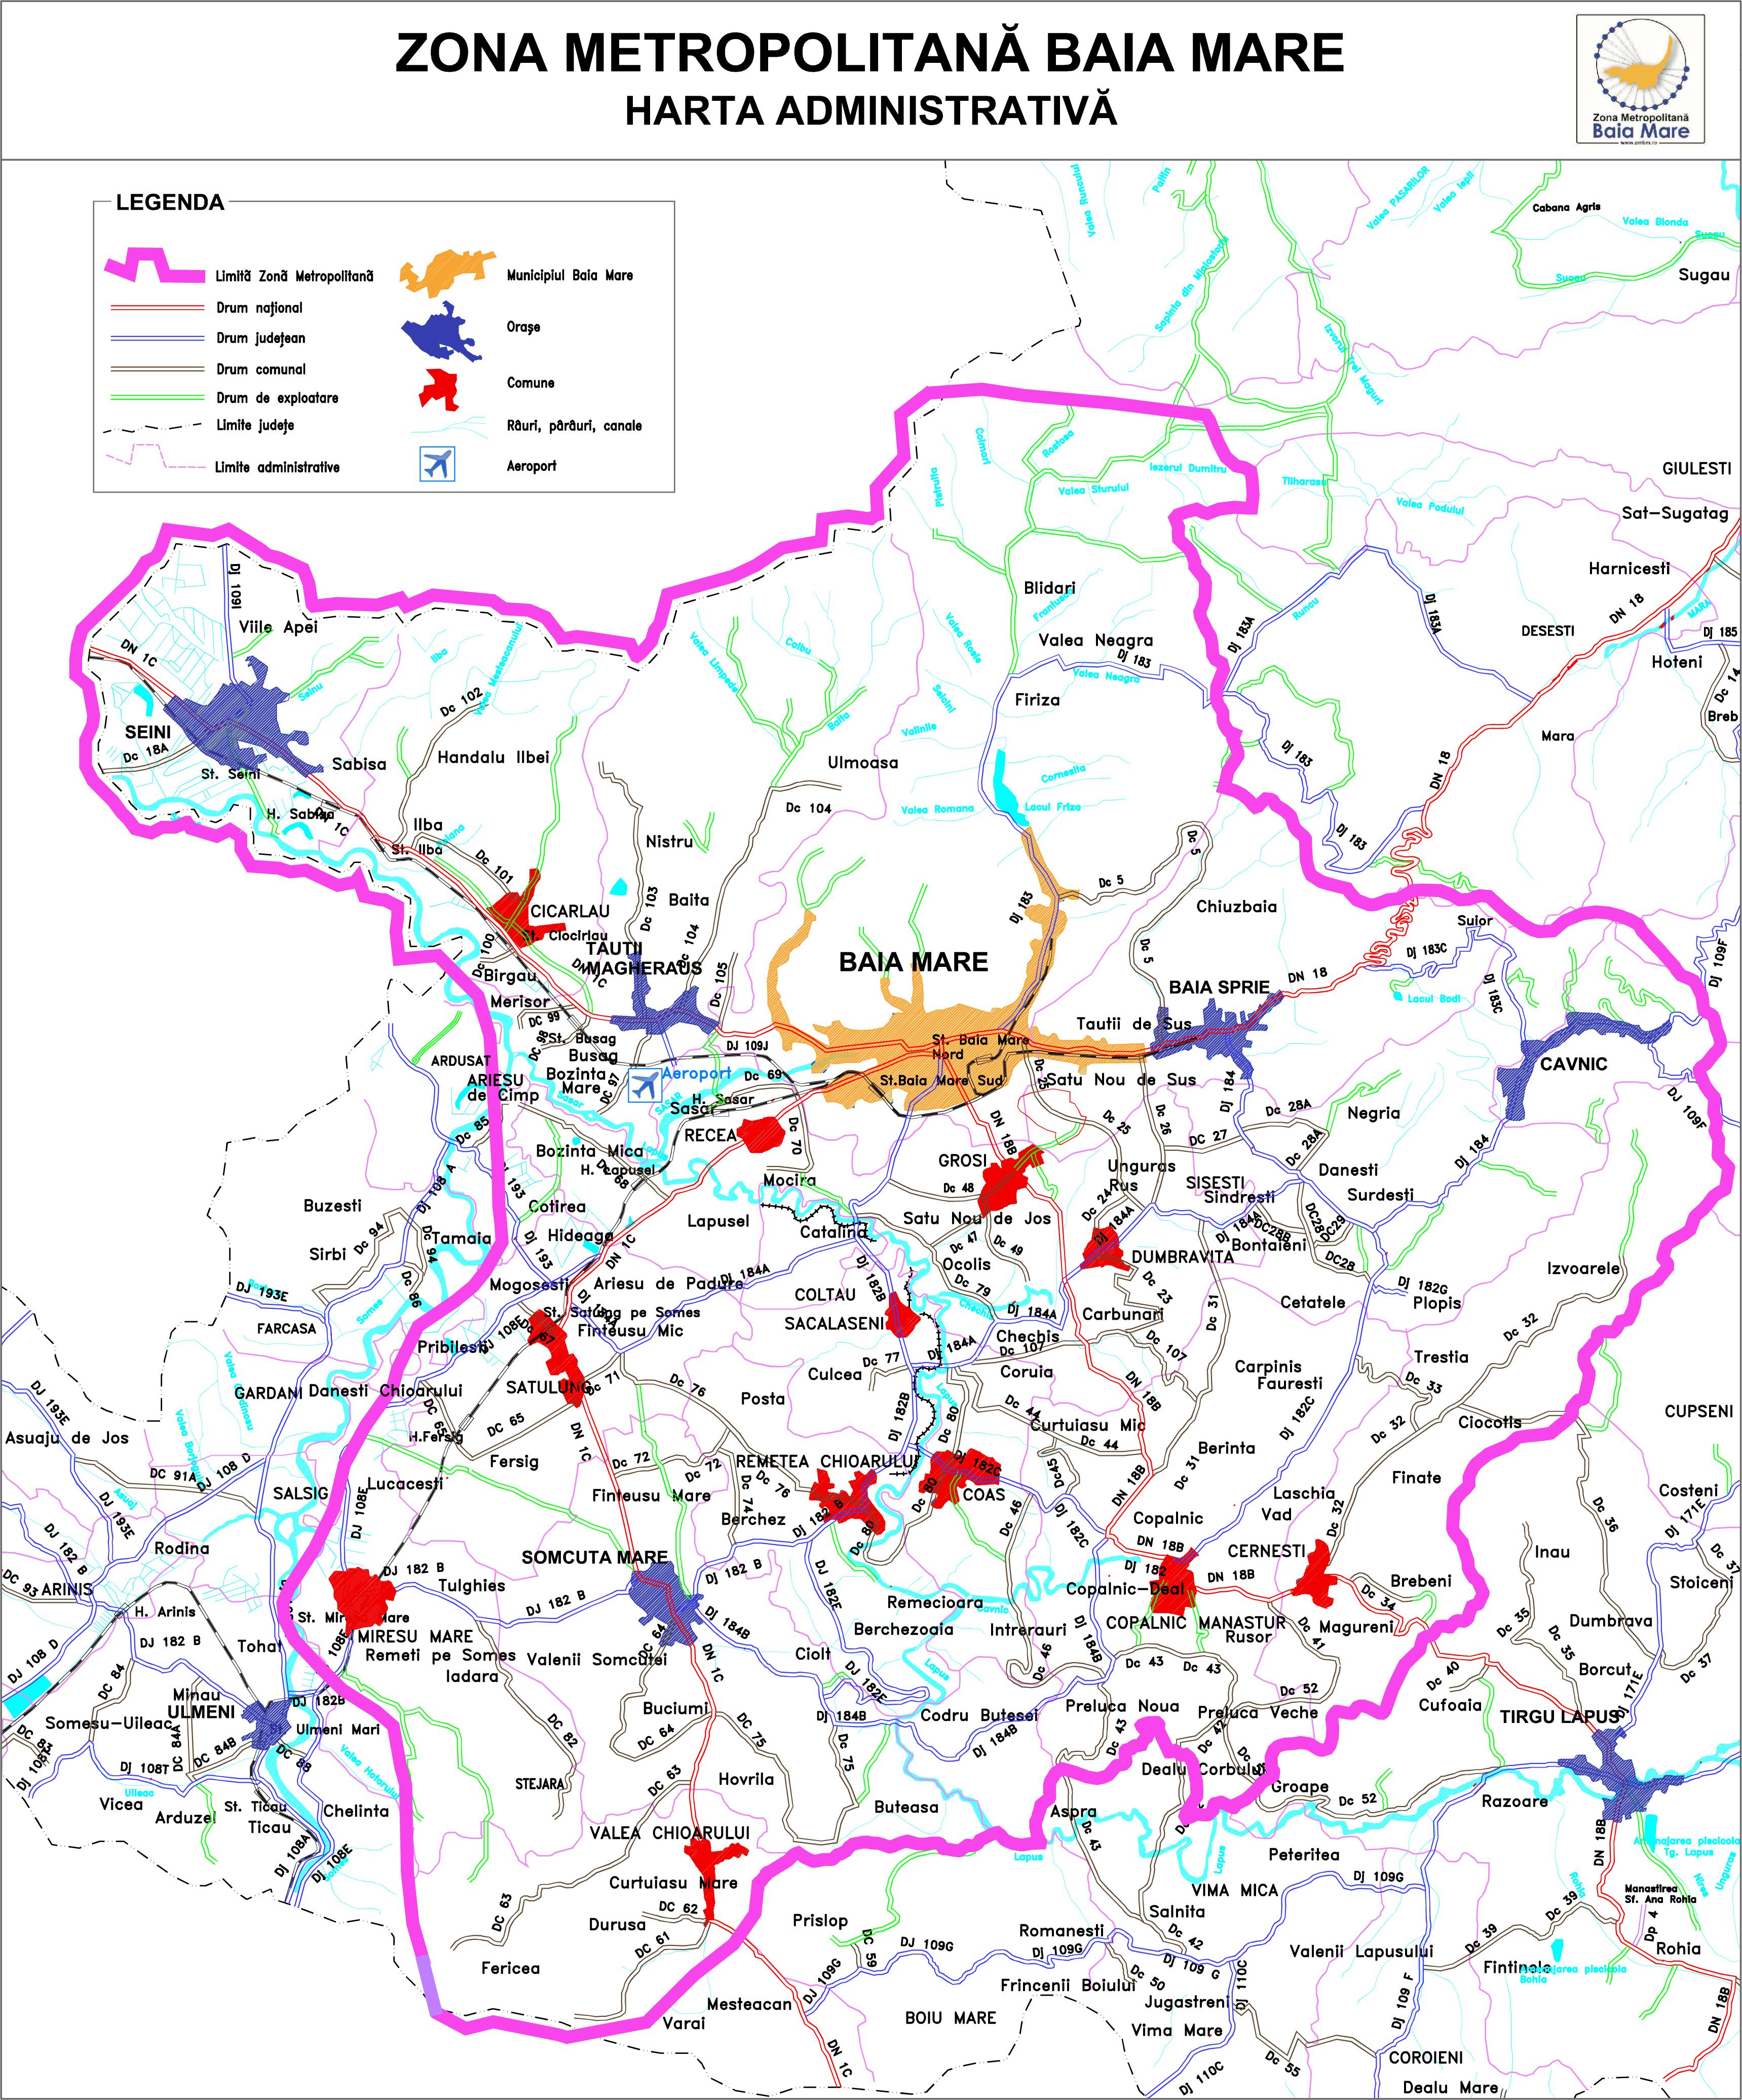 Baia Mare Metropolitan Area Wikipedia